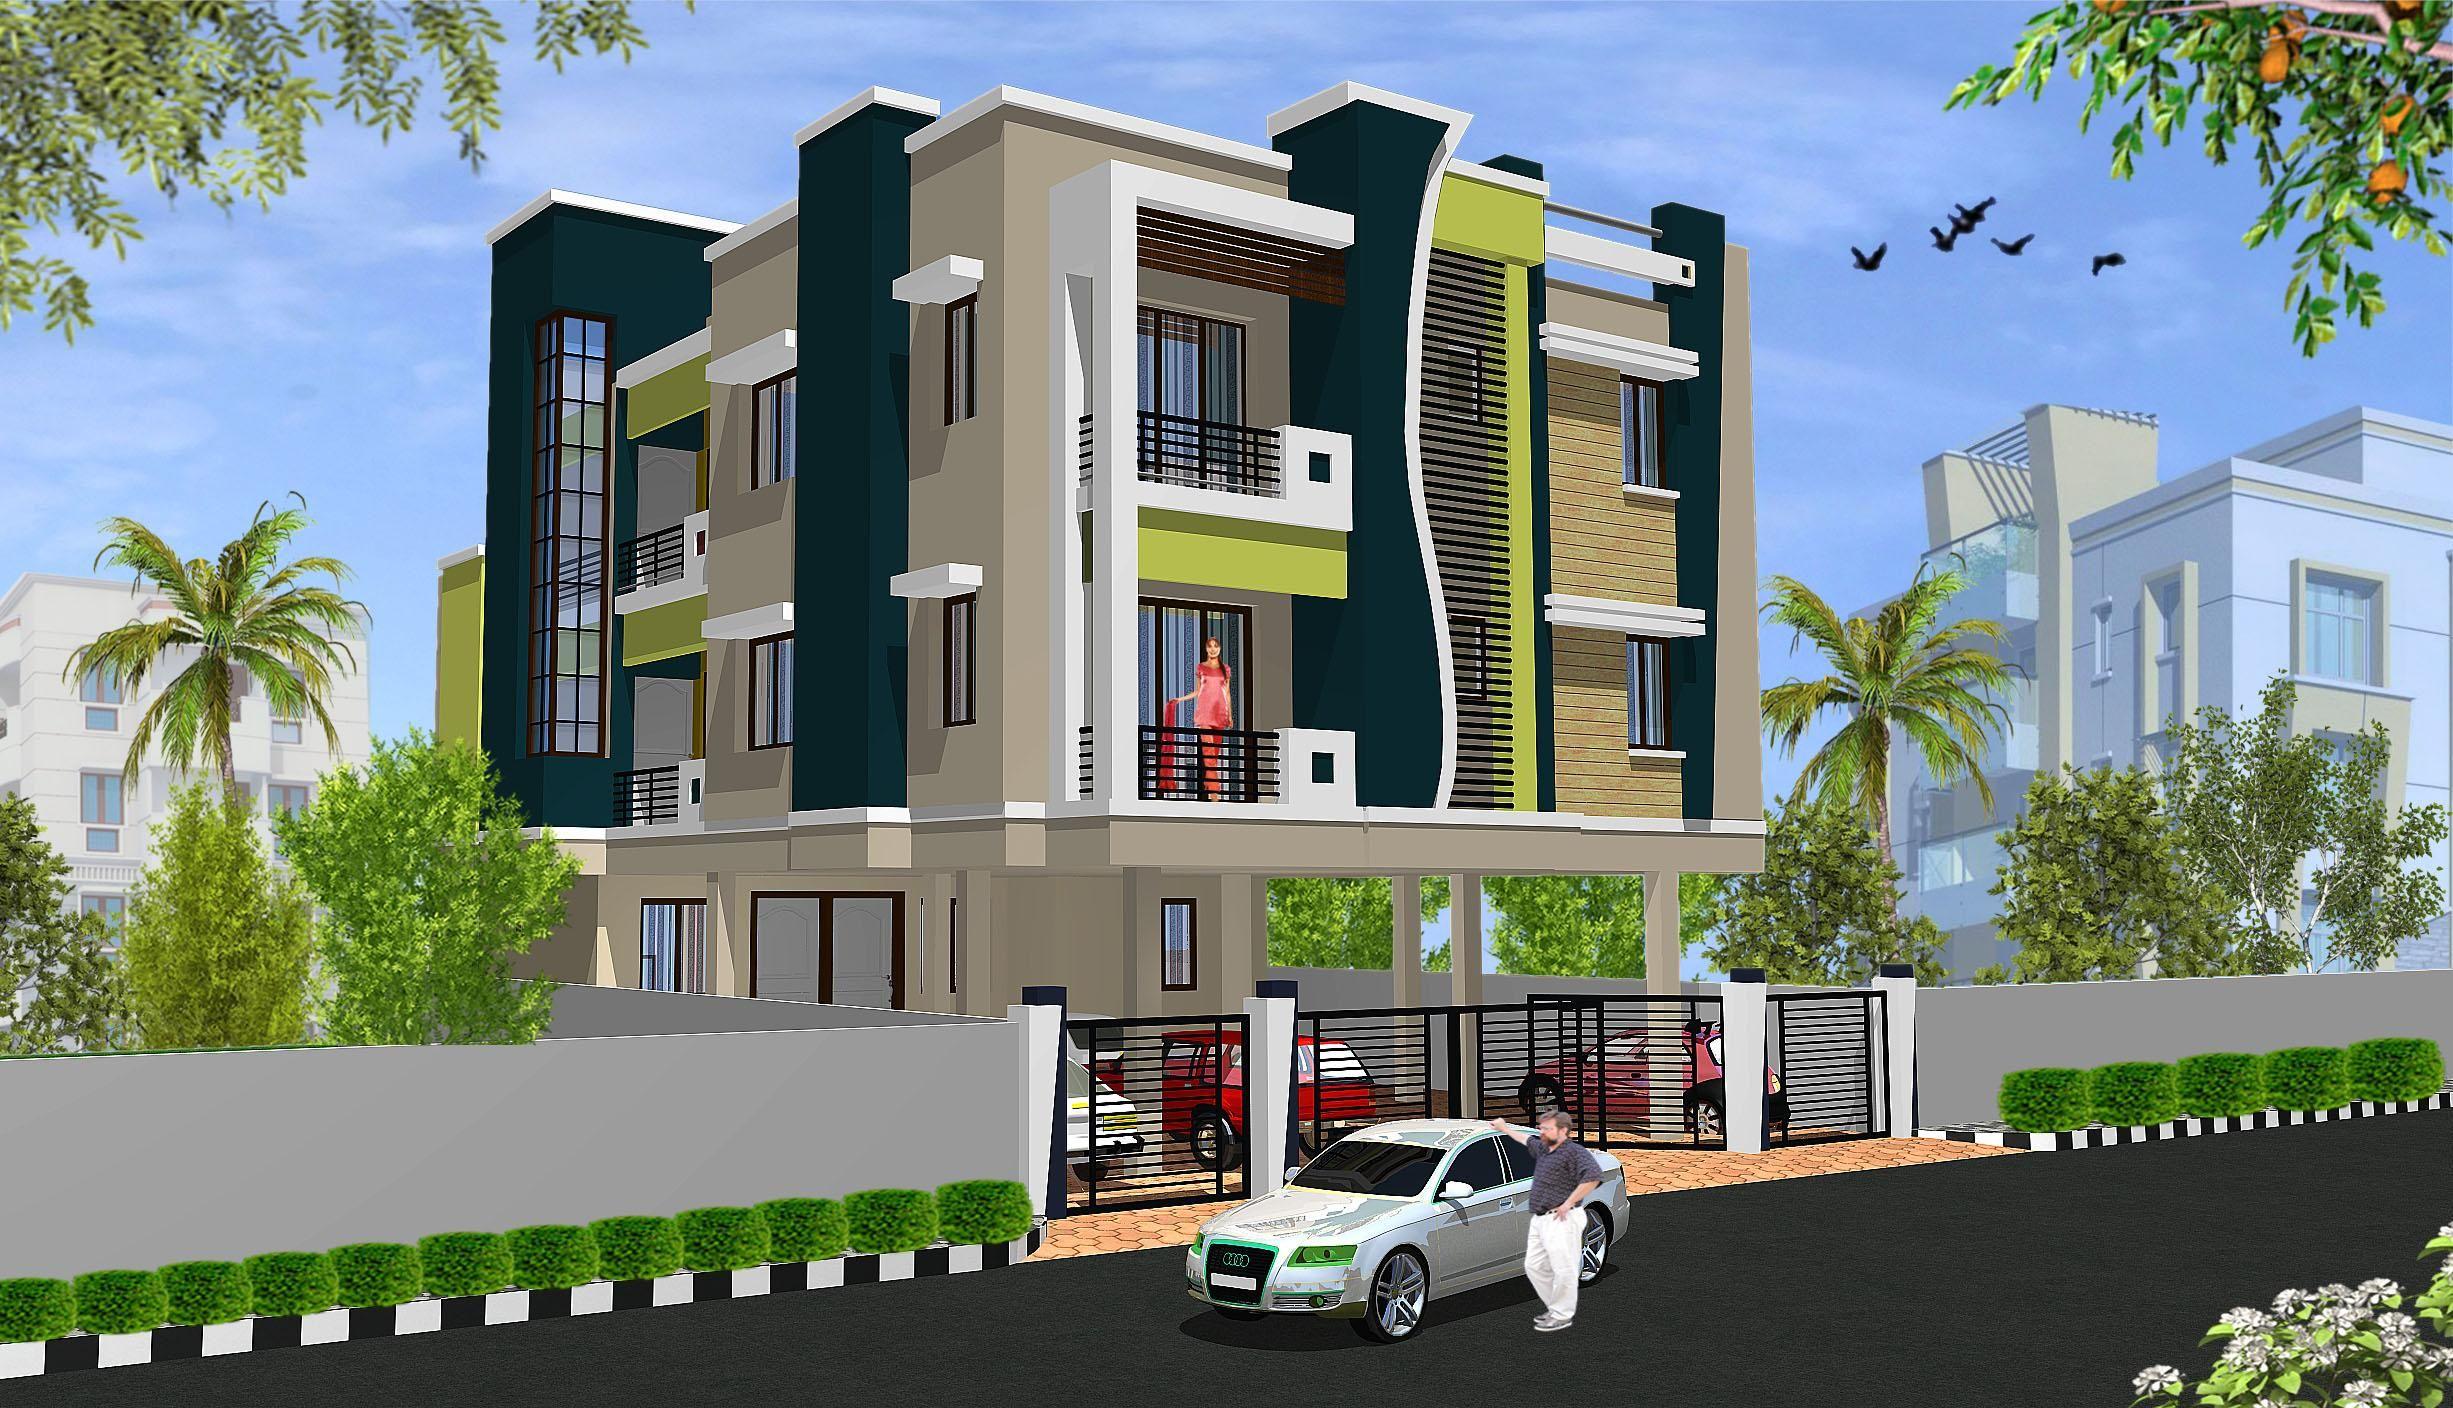 Viswak Visvarupa is one of the popular Residential Developments in Kallikuppam, Ambattur neighborhood of Chennai. For More Call@ 044-43906467 OR, Visit: http://www.realtycompass.com/property-view-viswak-visvarupa-by-viswak-constructions-in-chennai-north